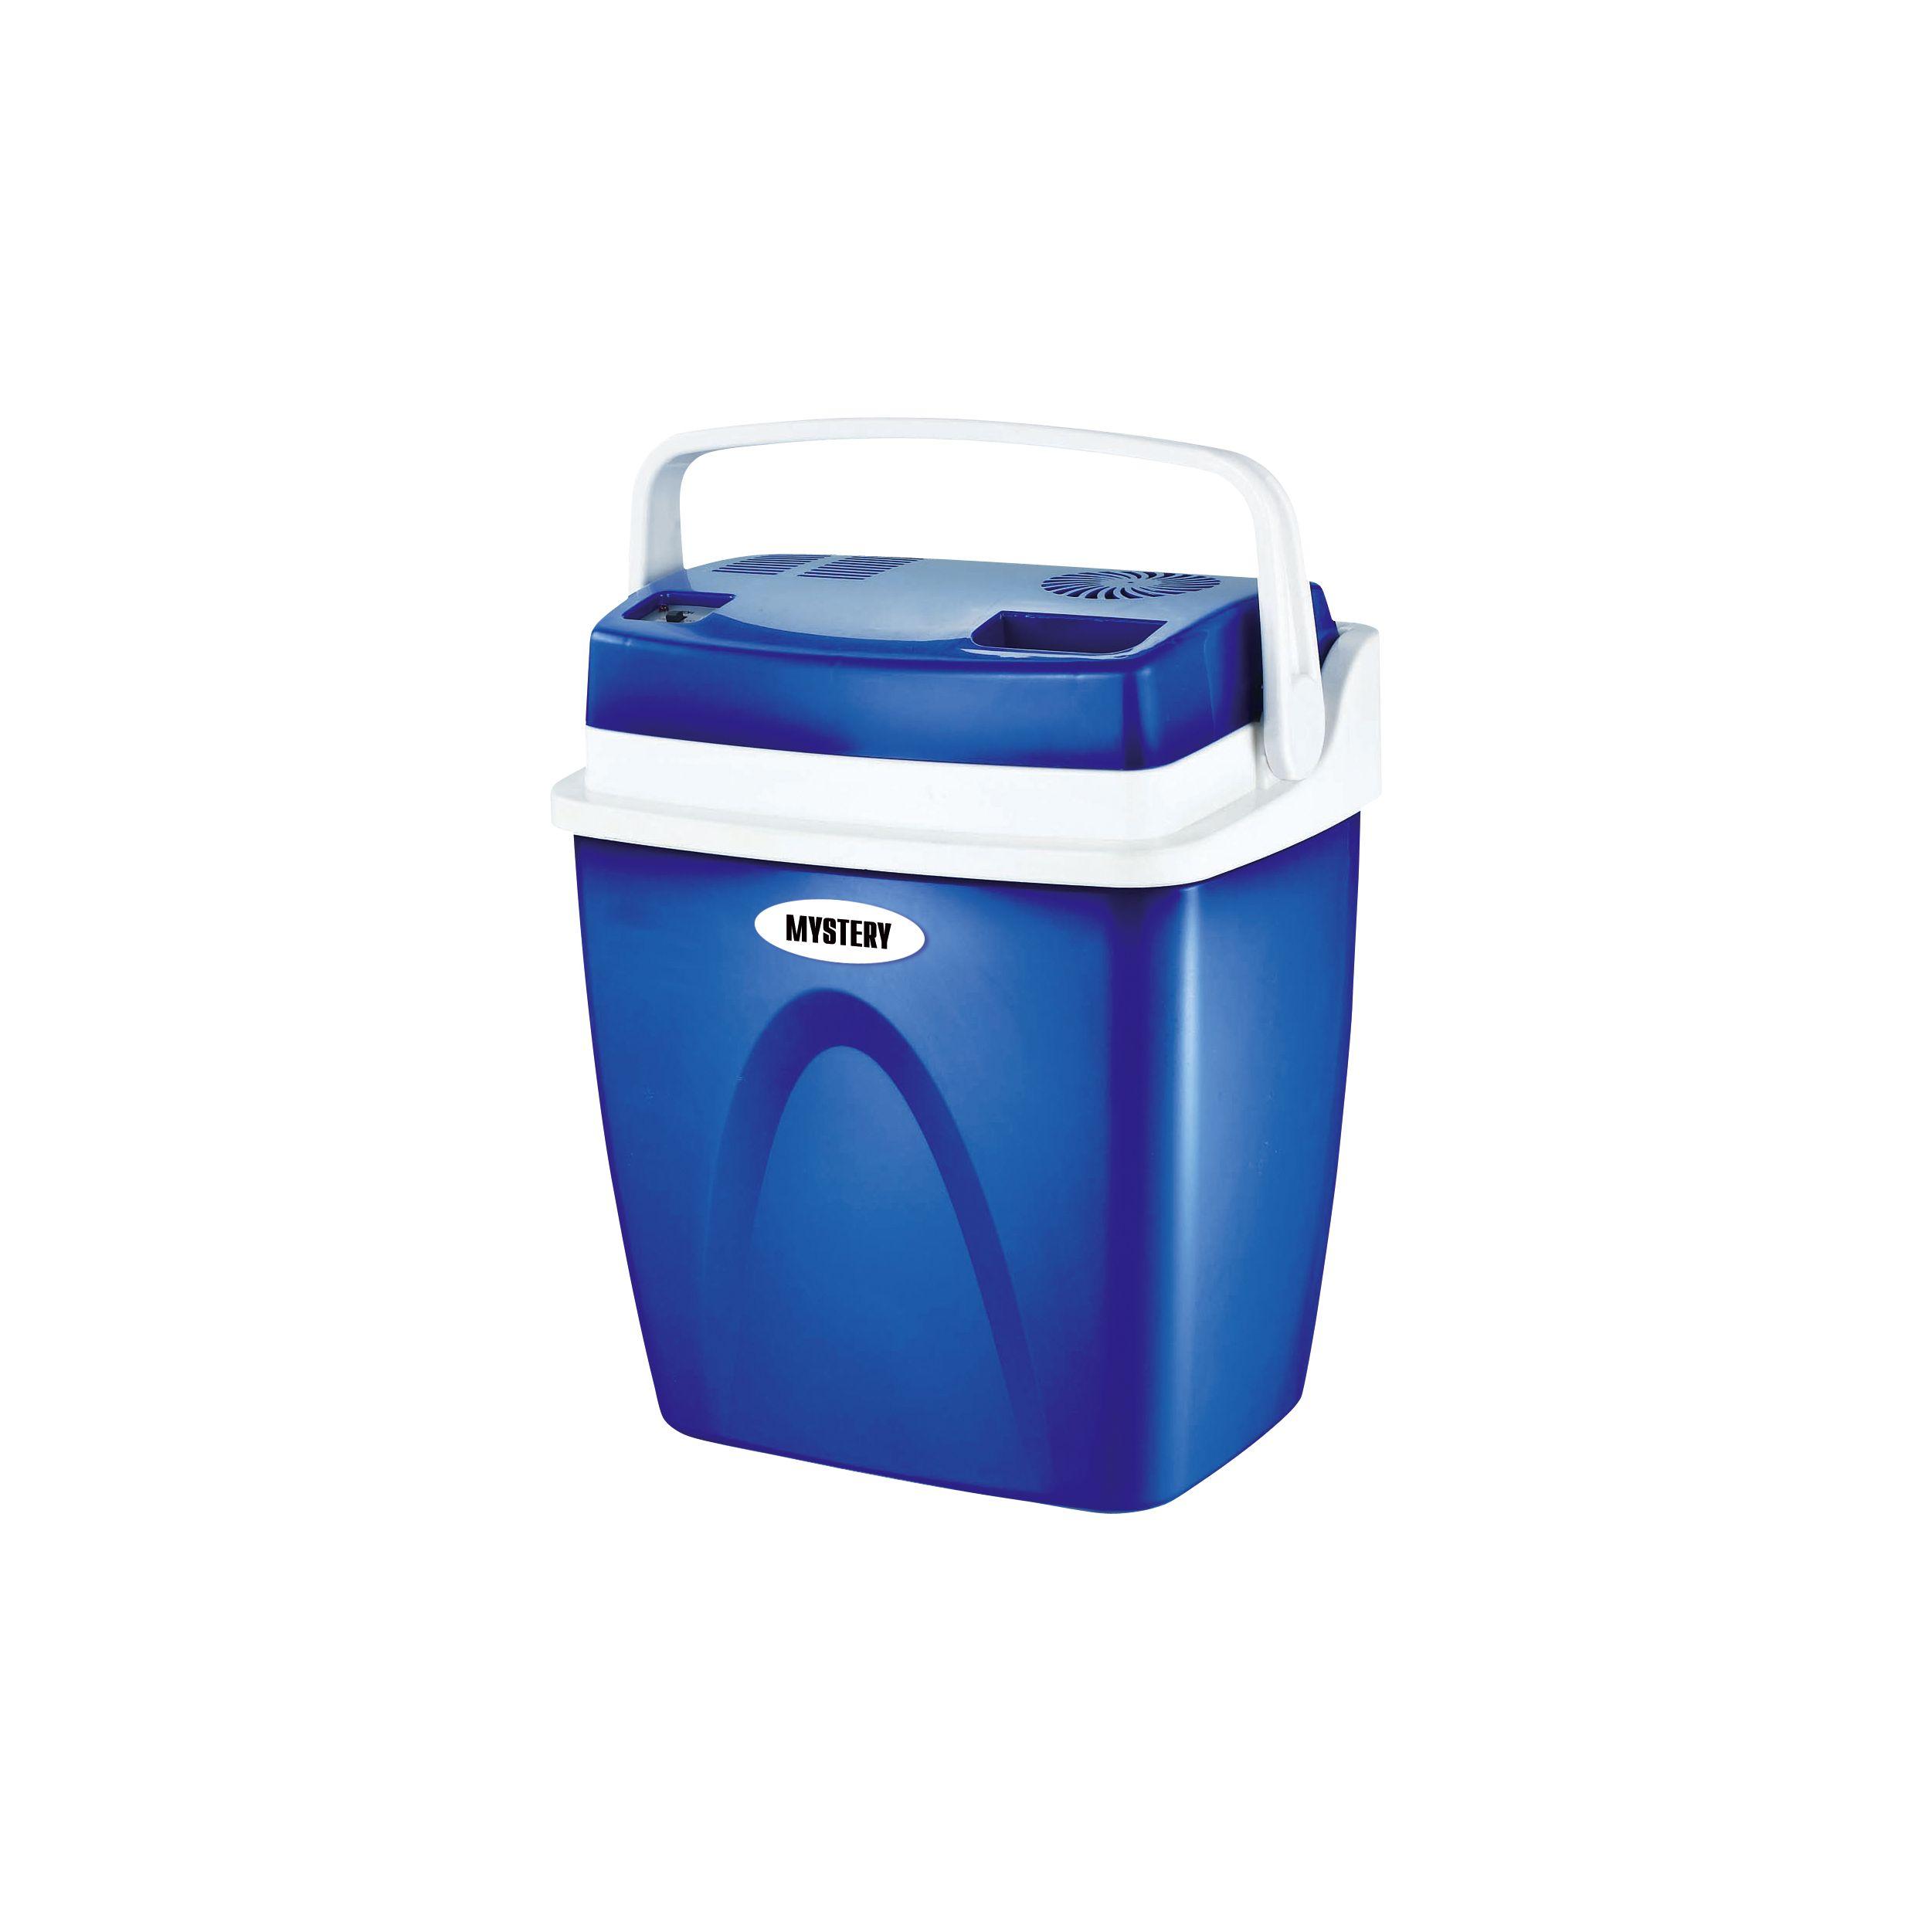 Термохолодильник Mystery MTC-21Сумки-холодильники<br><br><br>Артикул: MTC-21<br>Бренд: Mystery<br>Объем (л): 0<br>Вес (кг): 4,2<br>Материал: пластик<br>Энергопотребление: A<br>Гарантия производителя: да<br>Общий объем (л): 21<br>Объем (л): 0